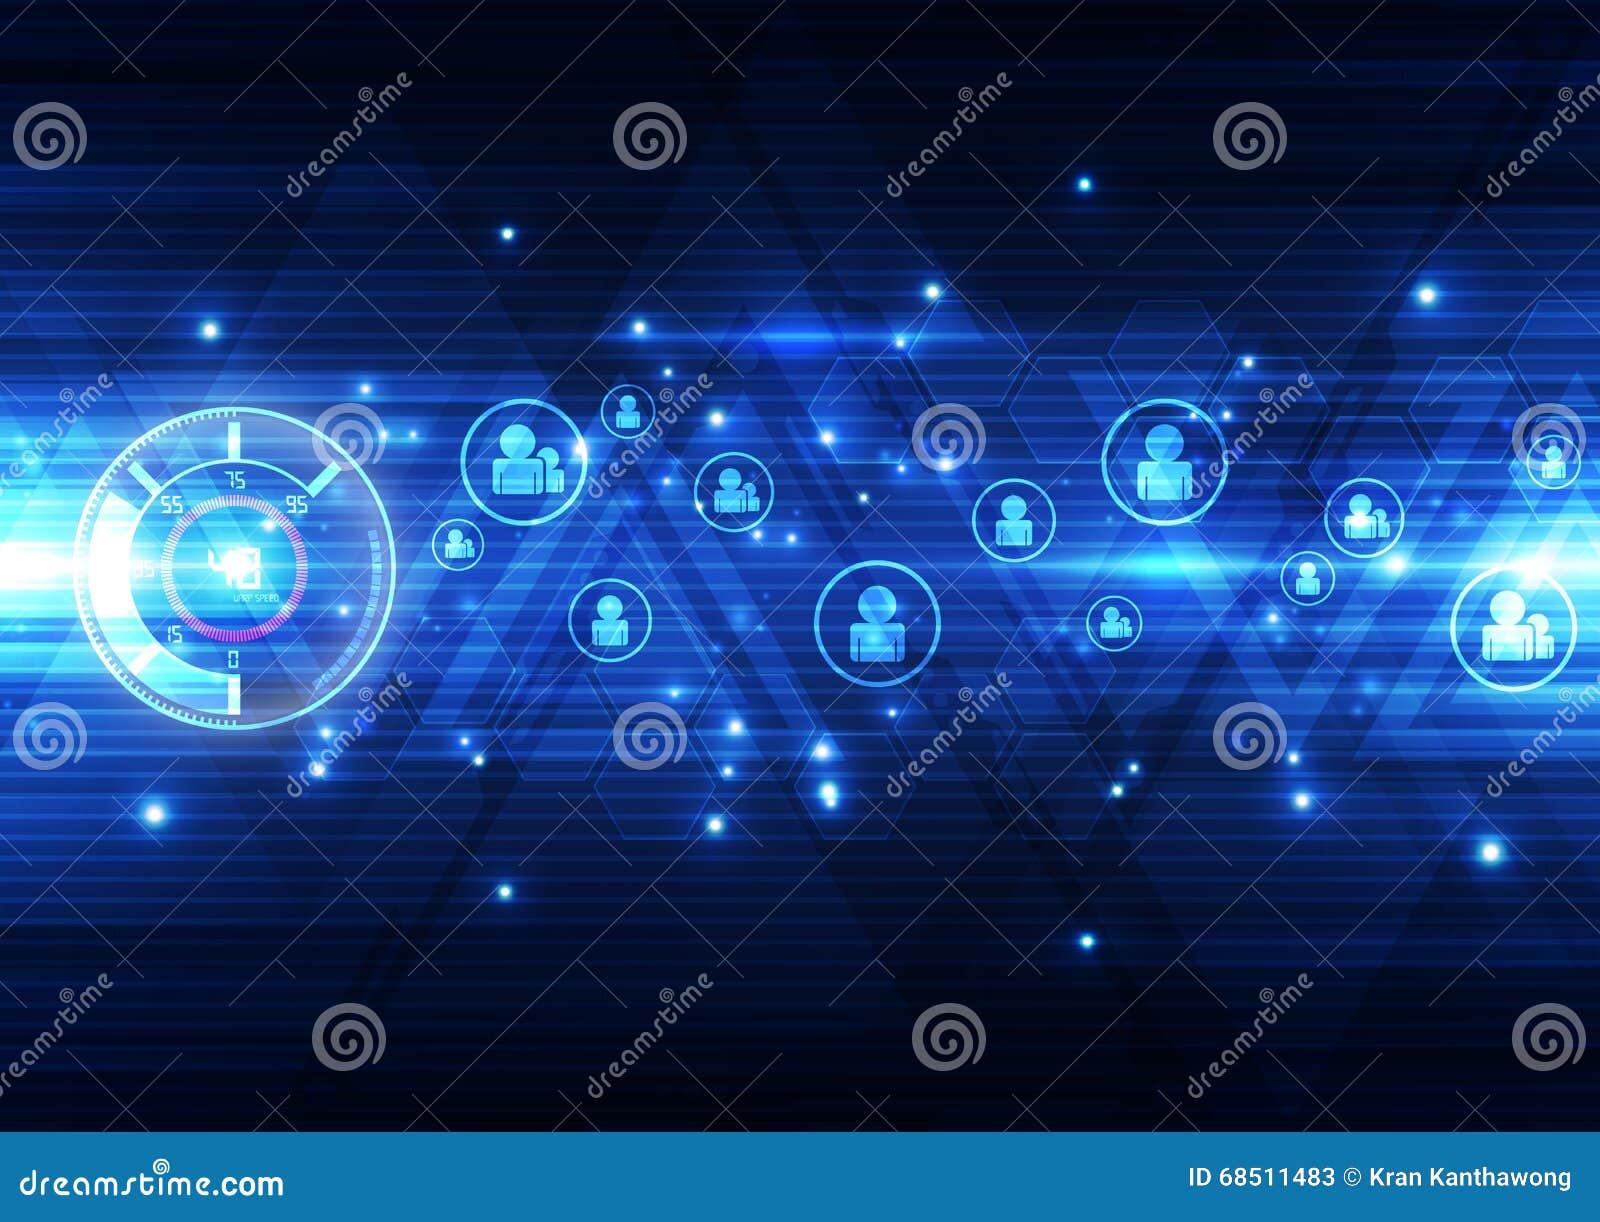 digital communications technology